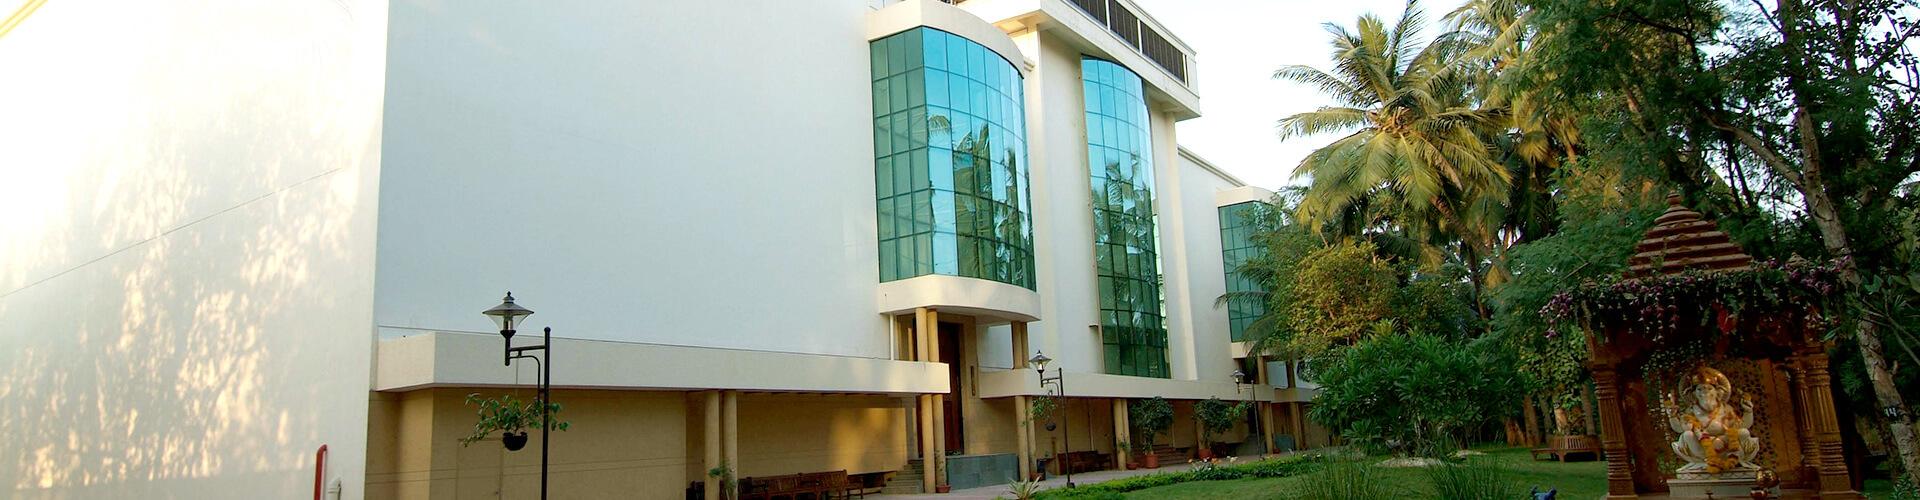 Film Studio Biggest Movie Studios In India Yash Raj Films